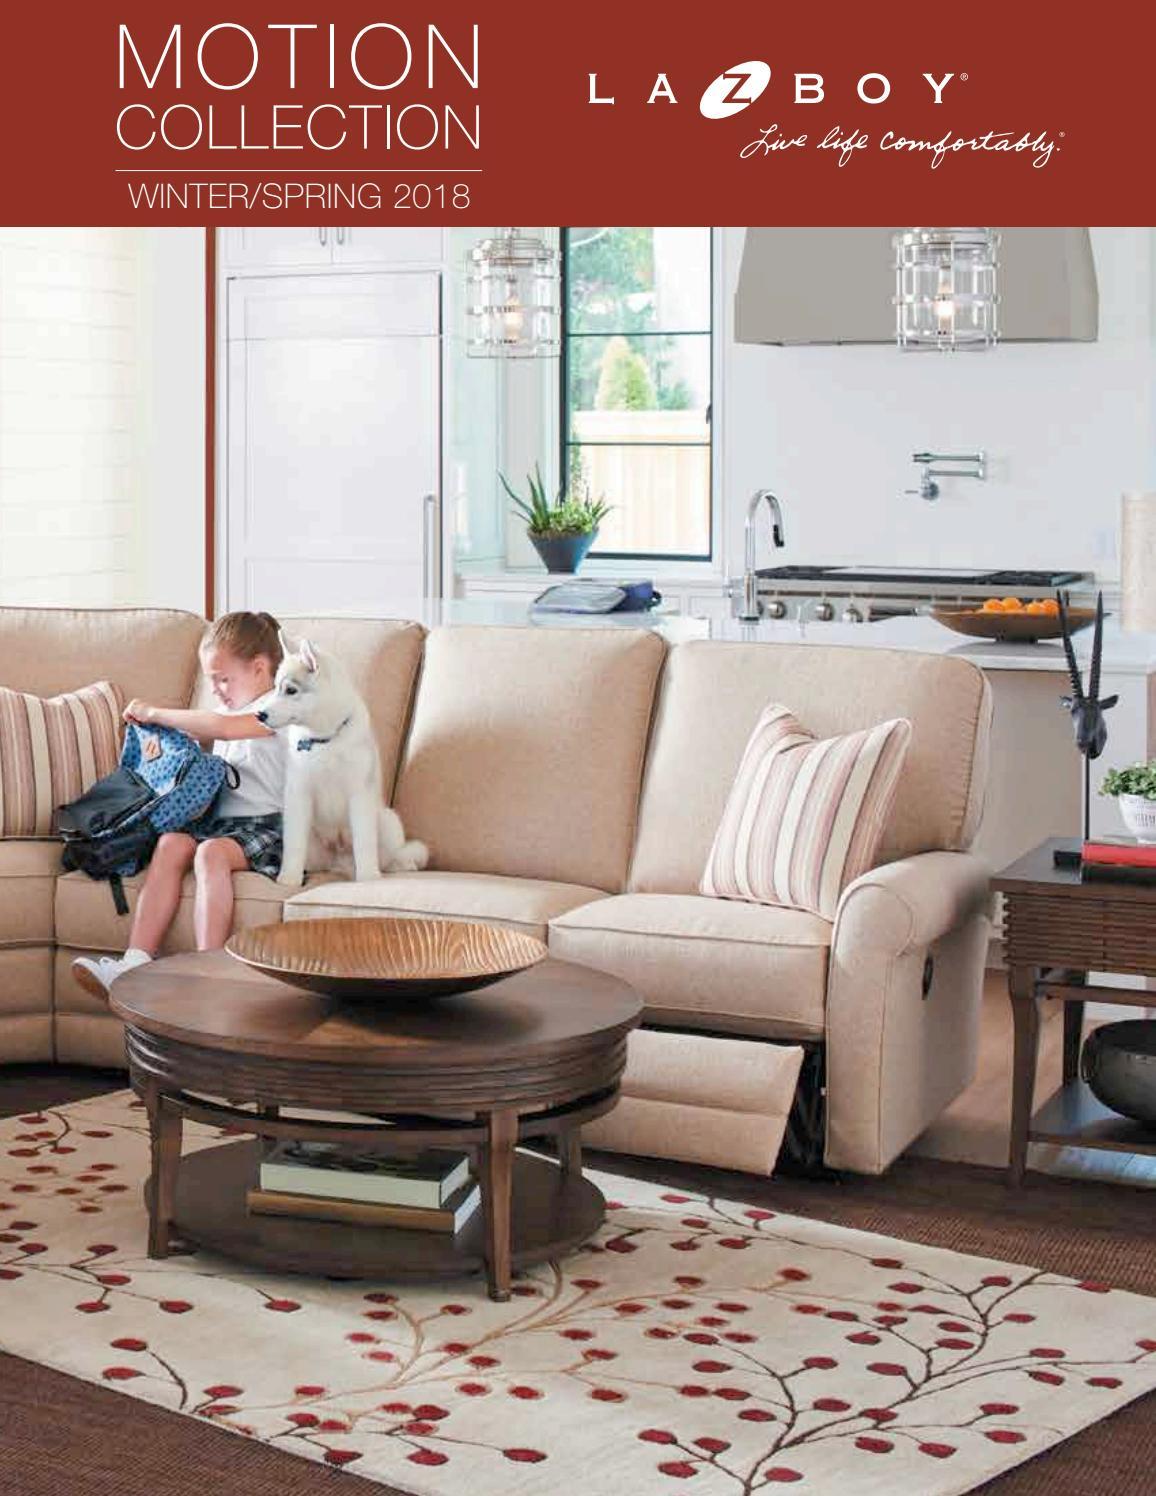 Astounding Mot Lores October2017 By Mattresssofawarehouse Issuu Andrewgaddart Wooden Chair Designs For Living Room Andrewgaddartcom